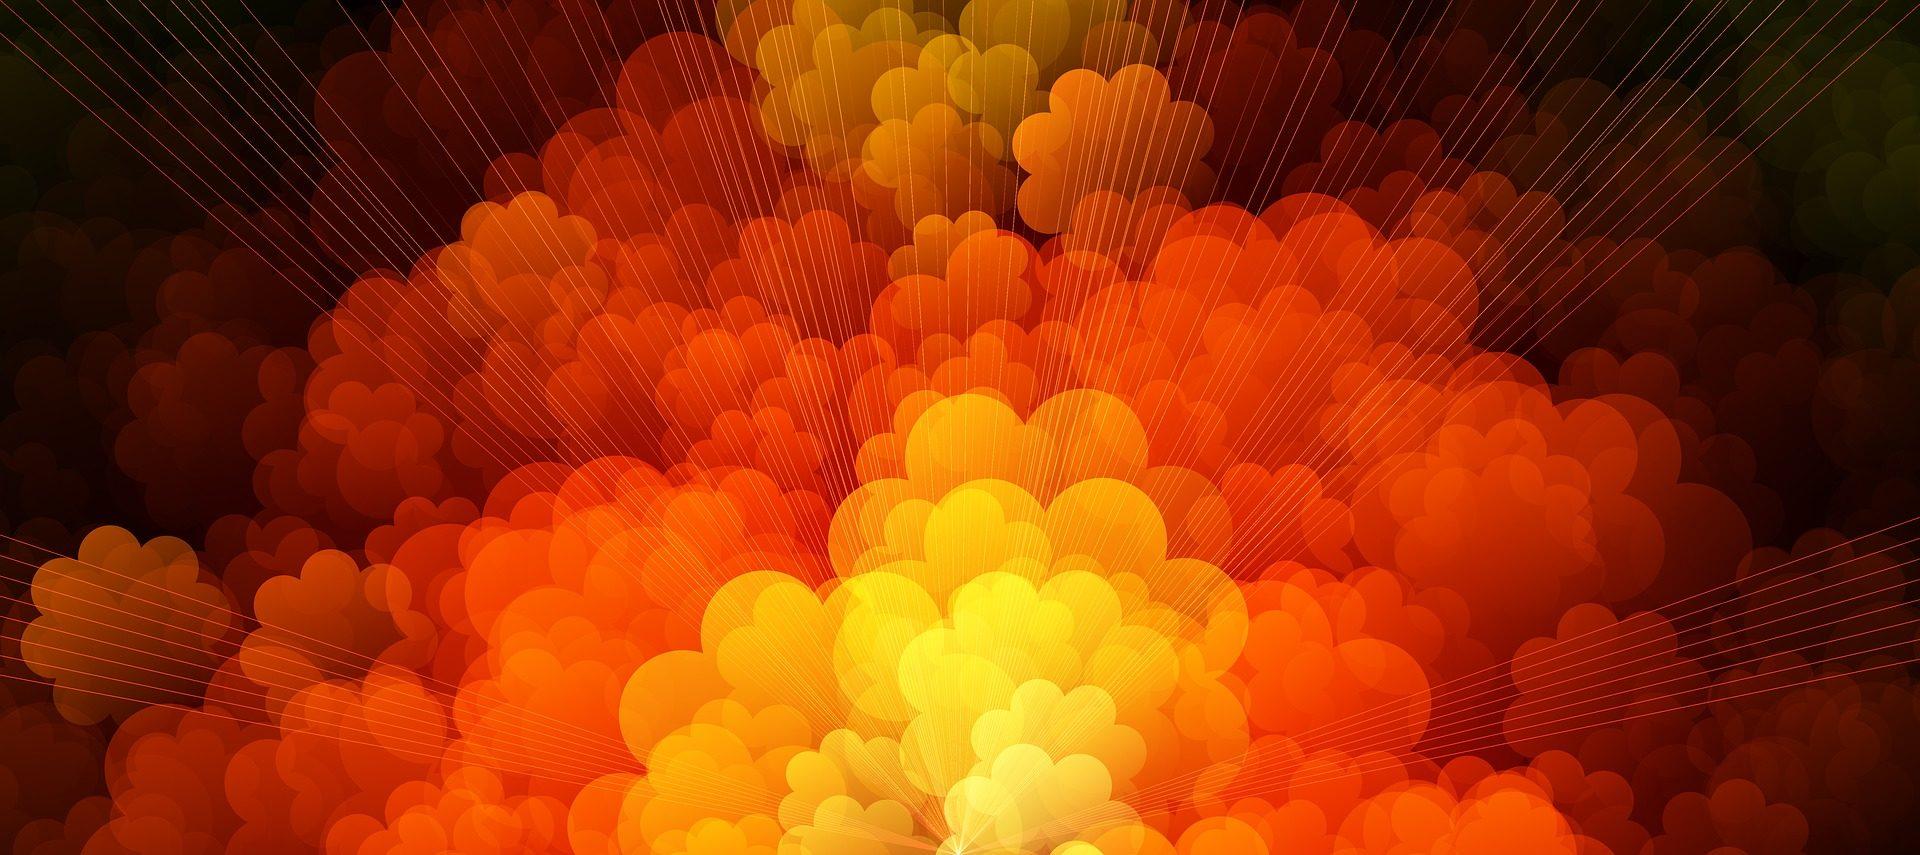 Formas, cores, nuvens, fumaça, círculos, listras, Laranja - Papéis de parede HD - Professor-falken.com